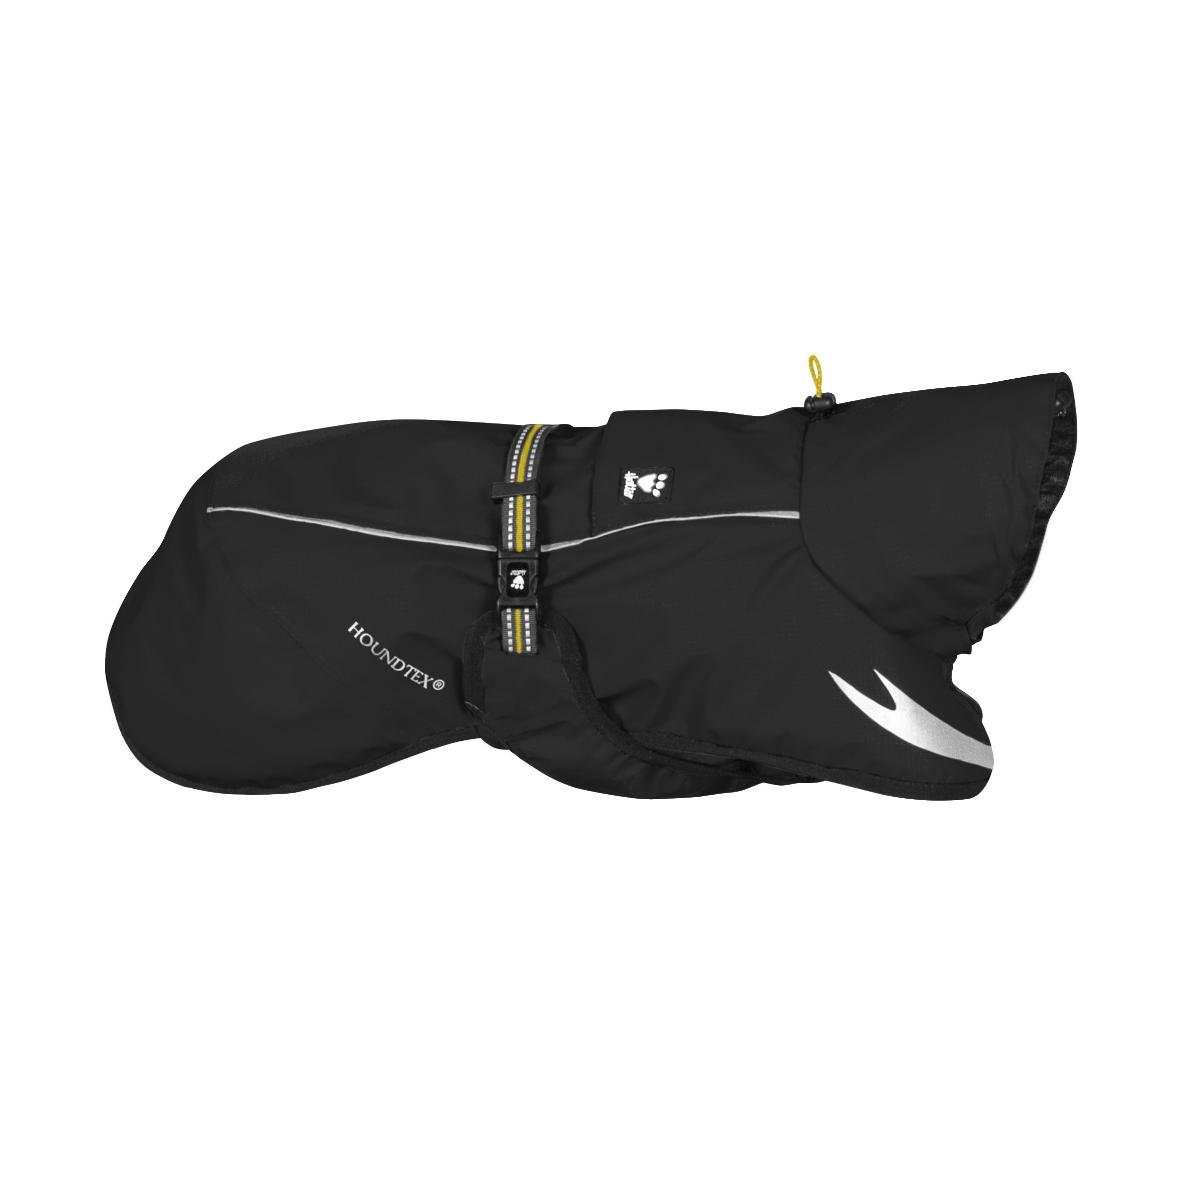 Hurtta Torrent Dog Coat - Raven